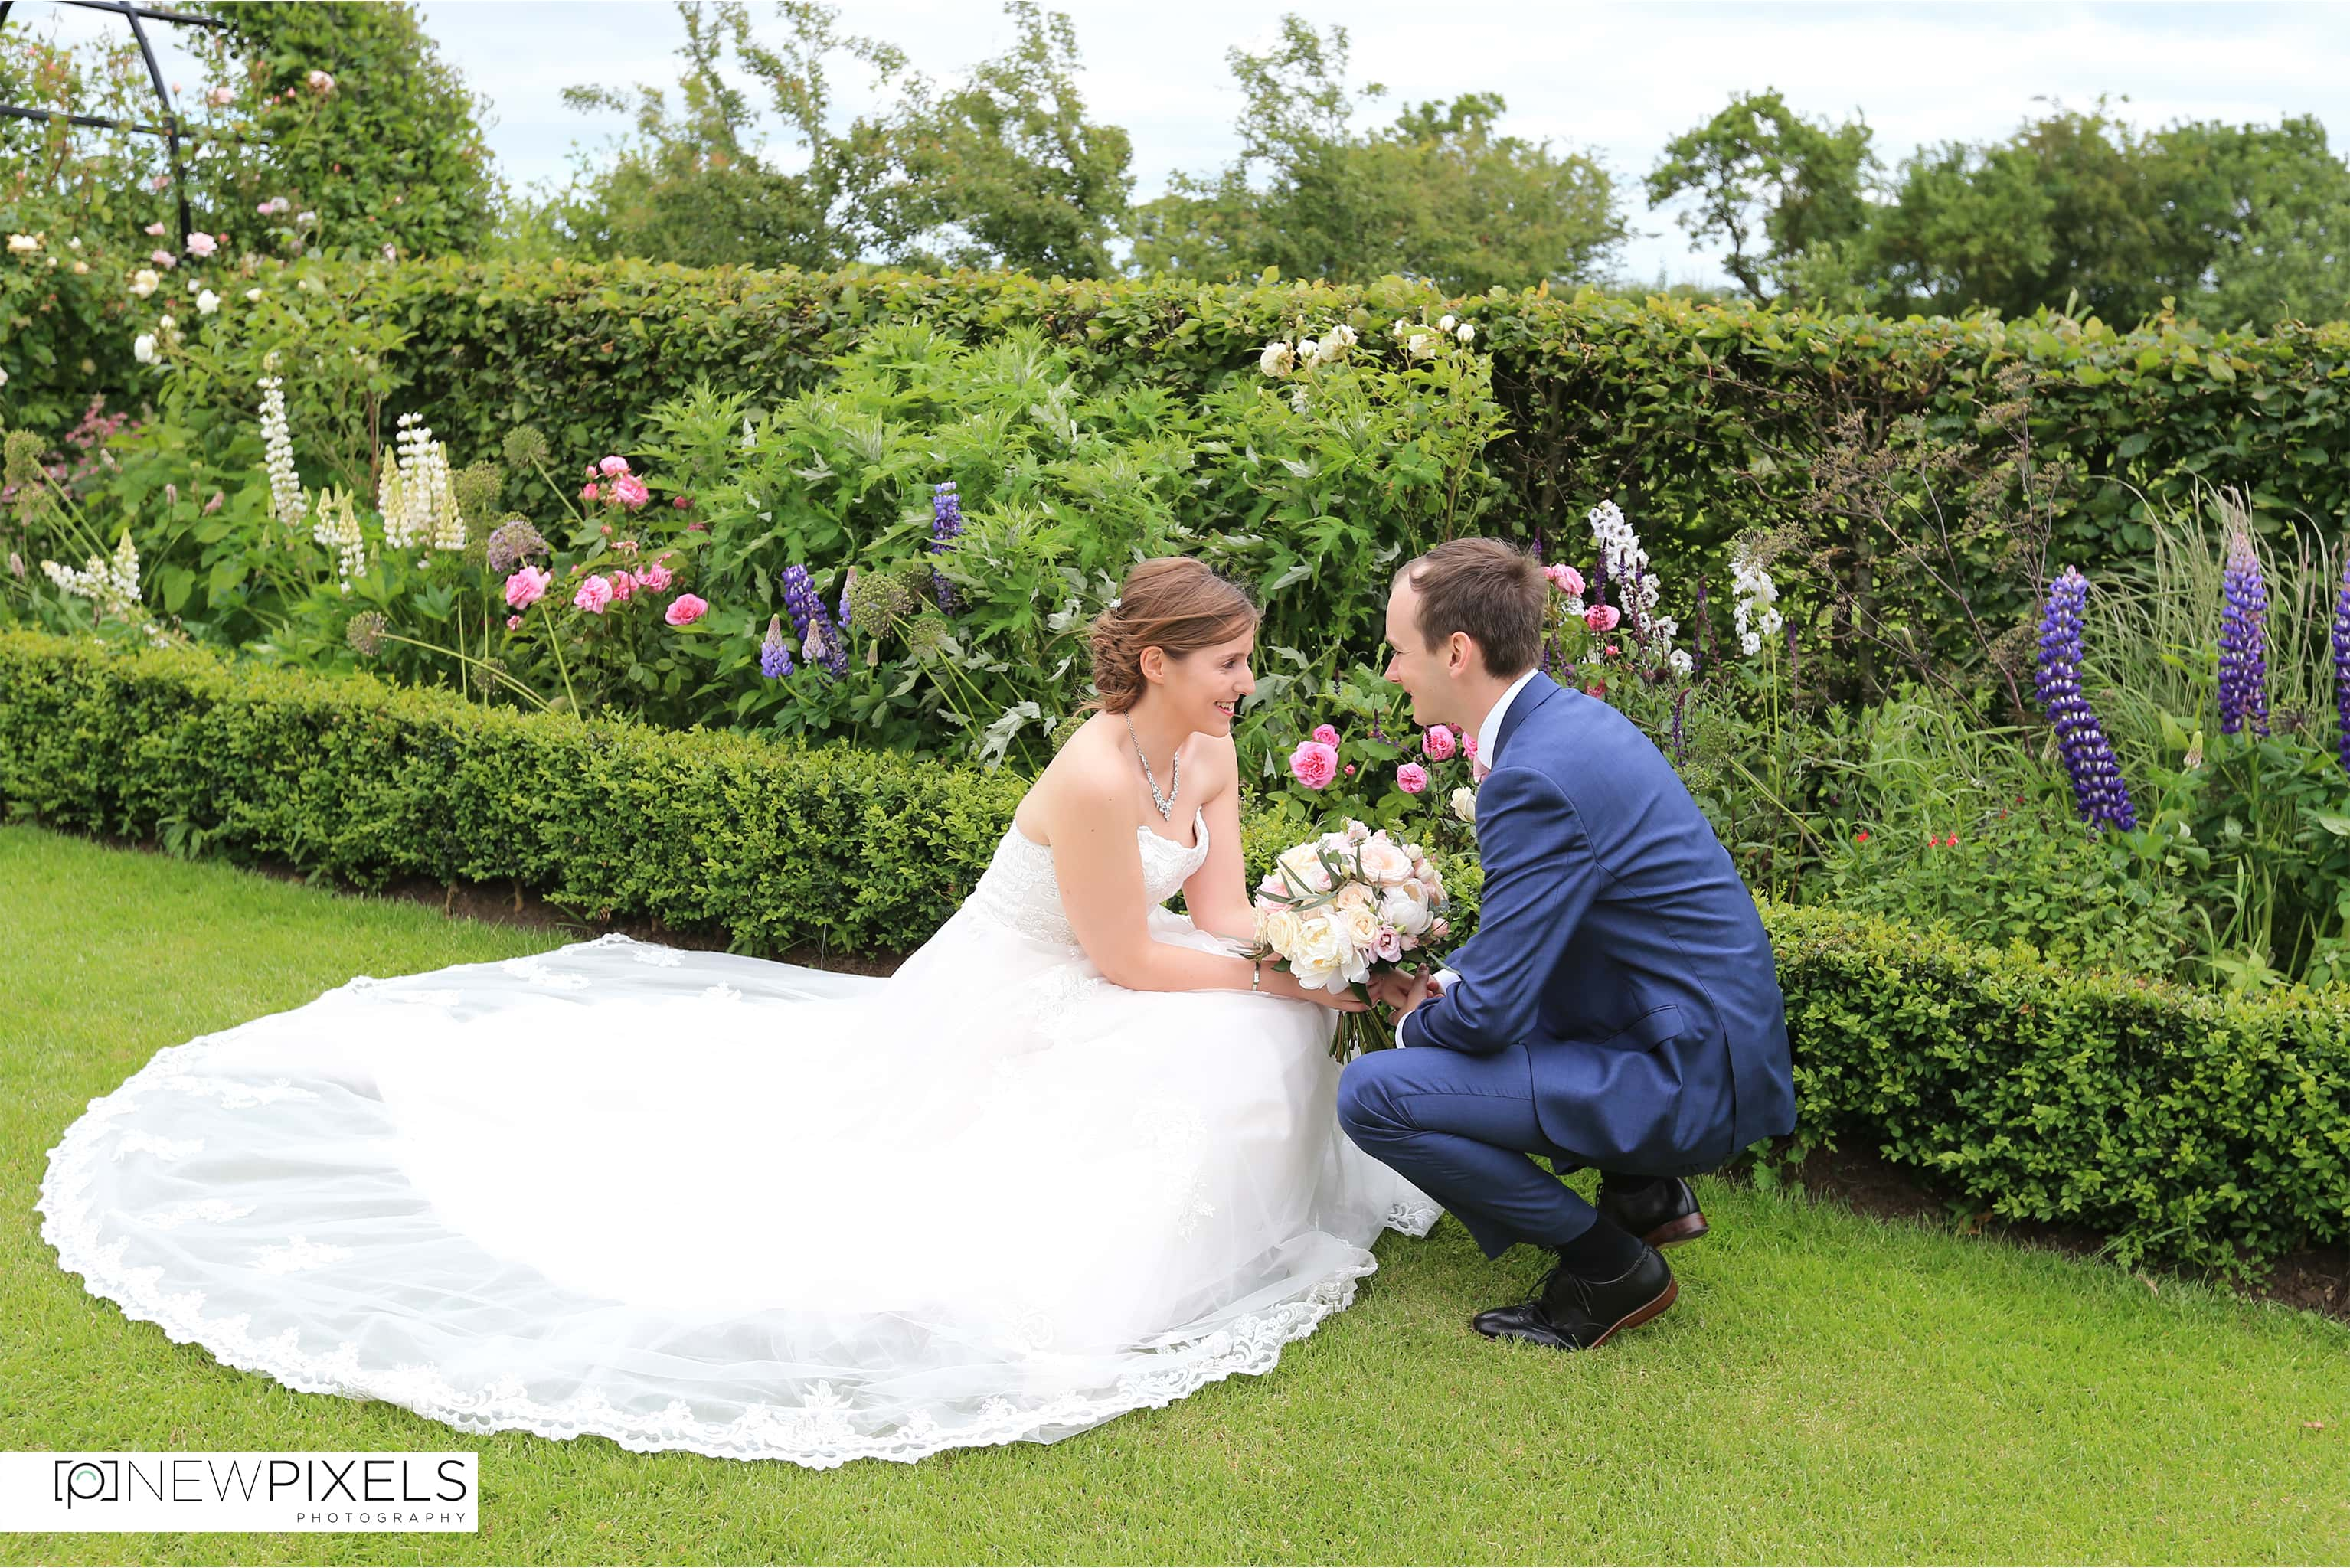 Hertfordshire Wedding Photography- New Pixels100